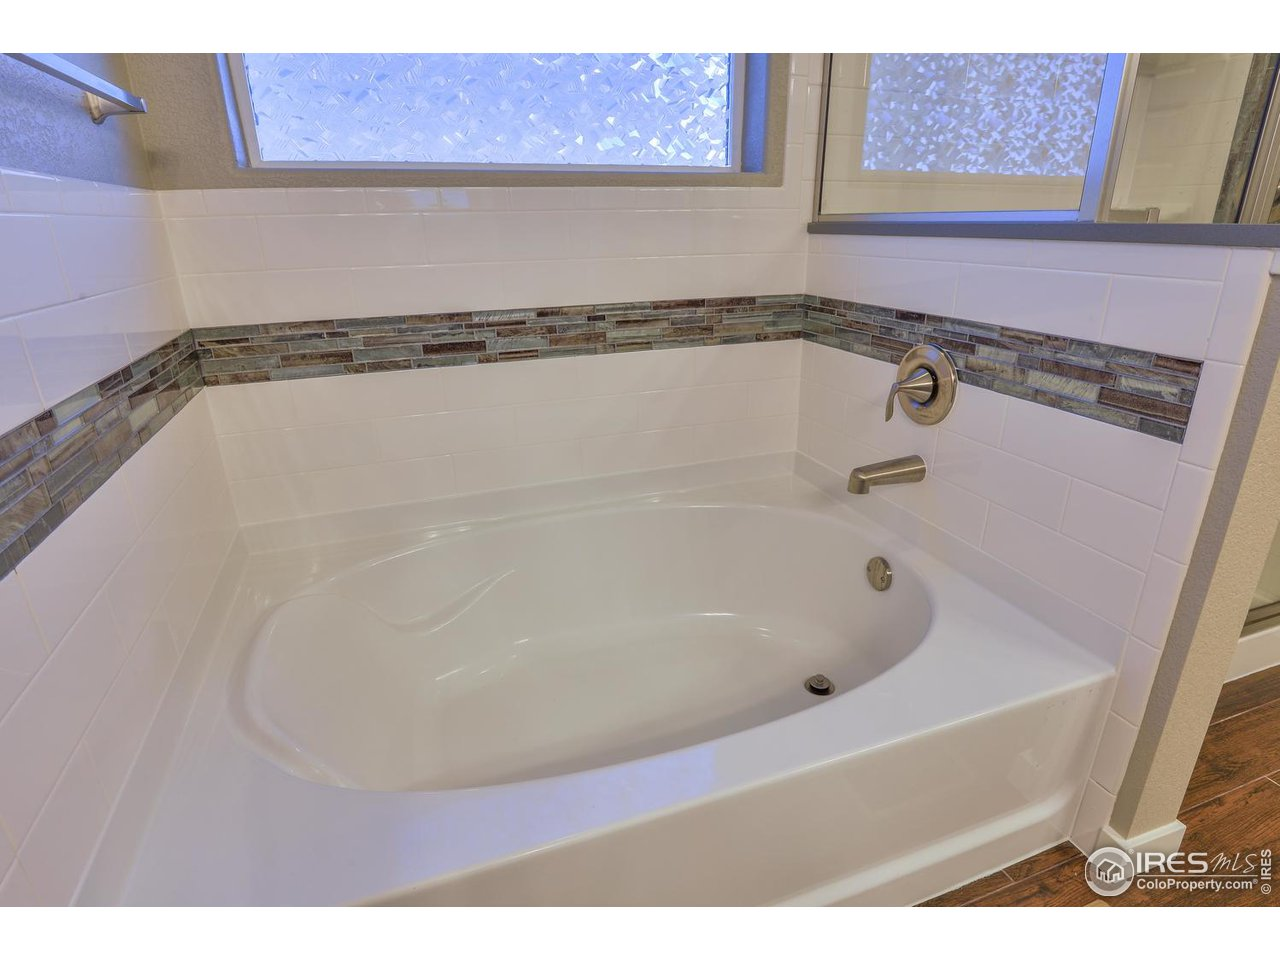 Custom Tile Showers and Tubs